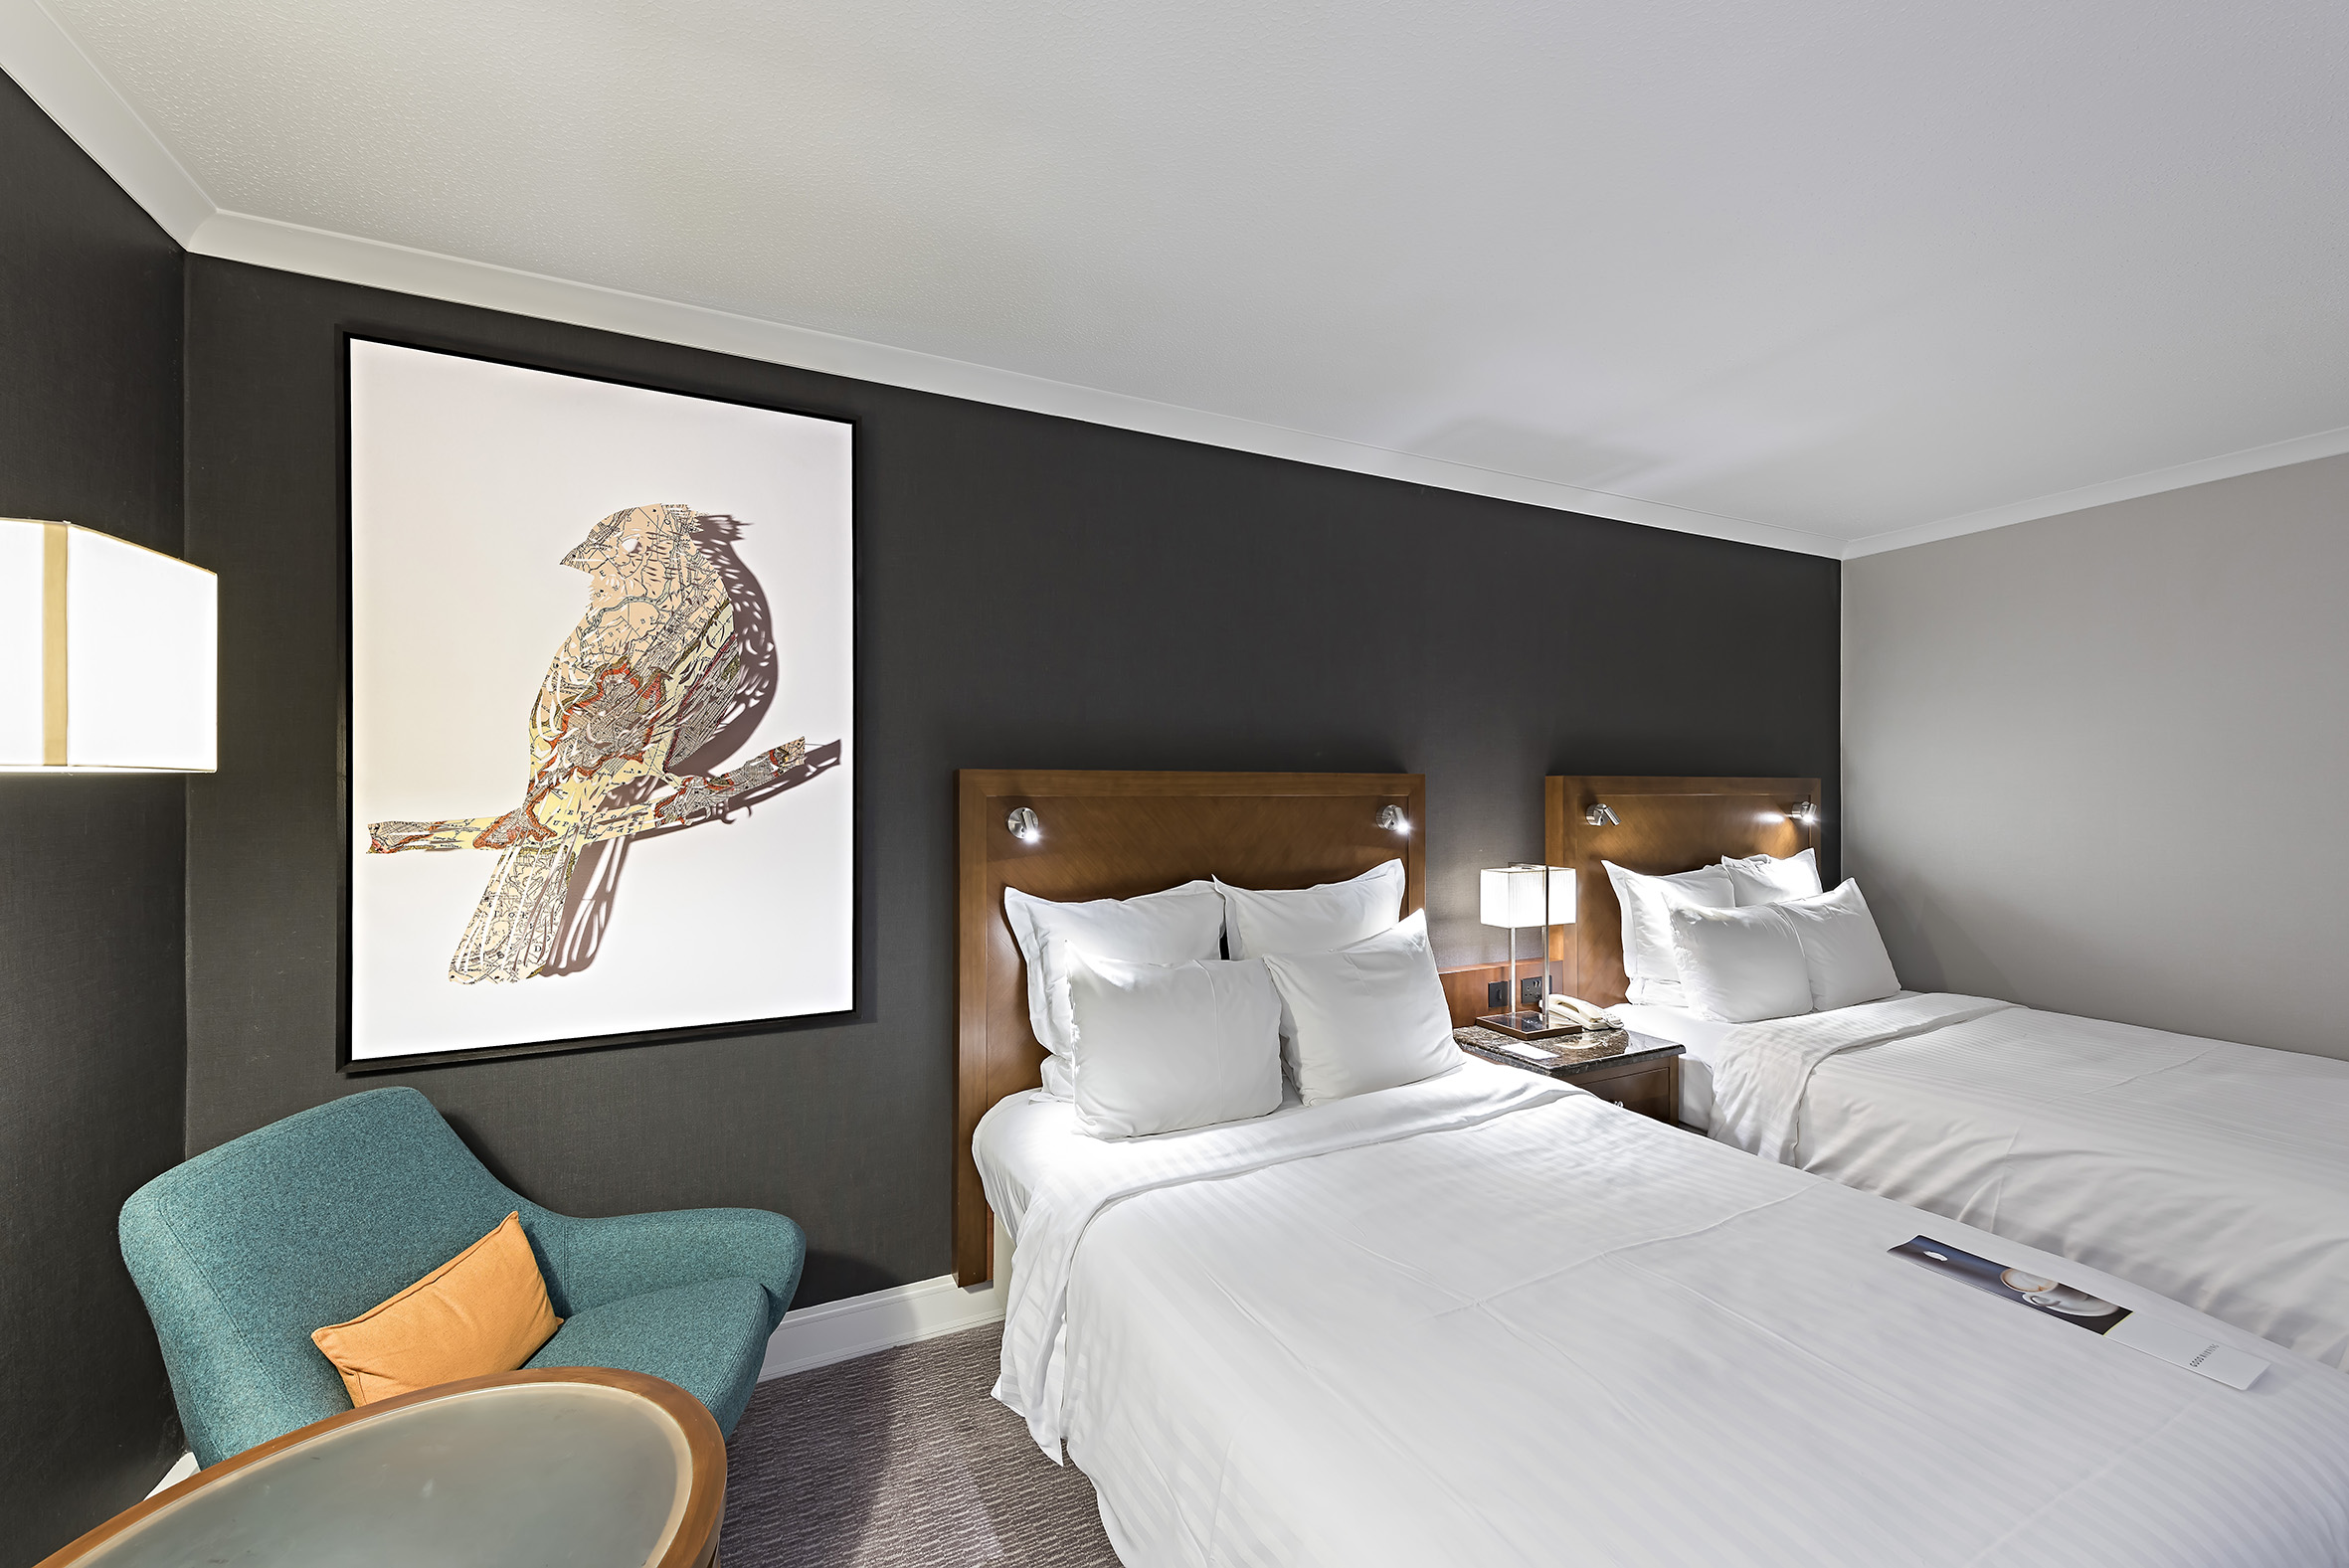 18 u2013 for the guestrooms designed by anita rosato interior design